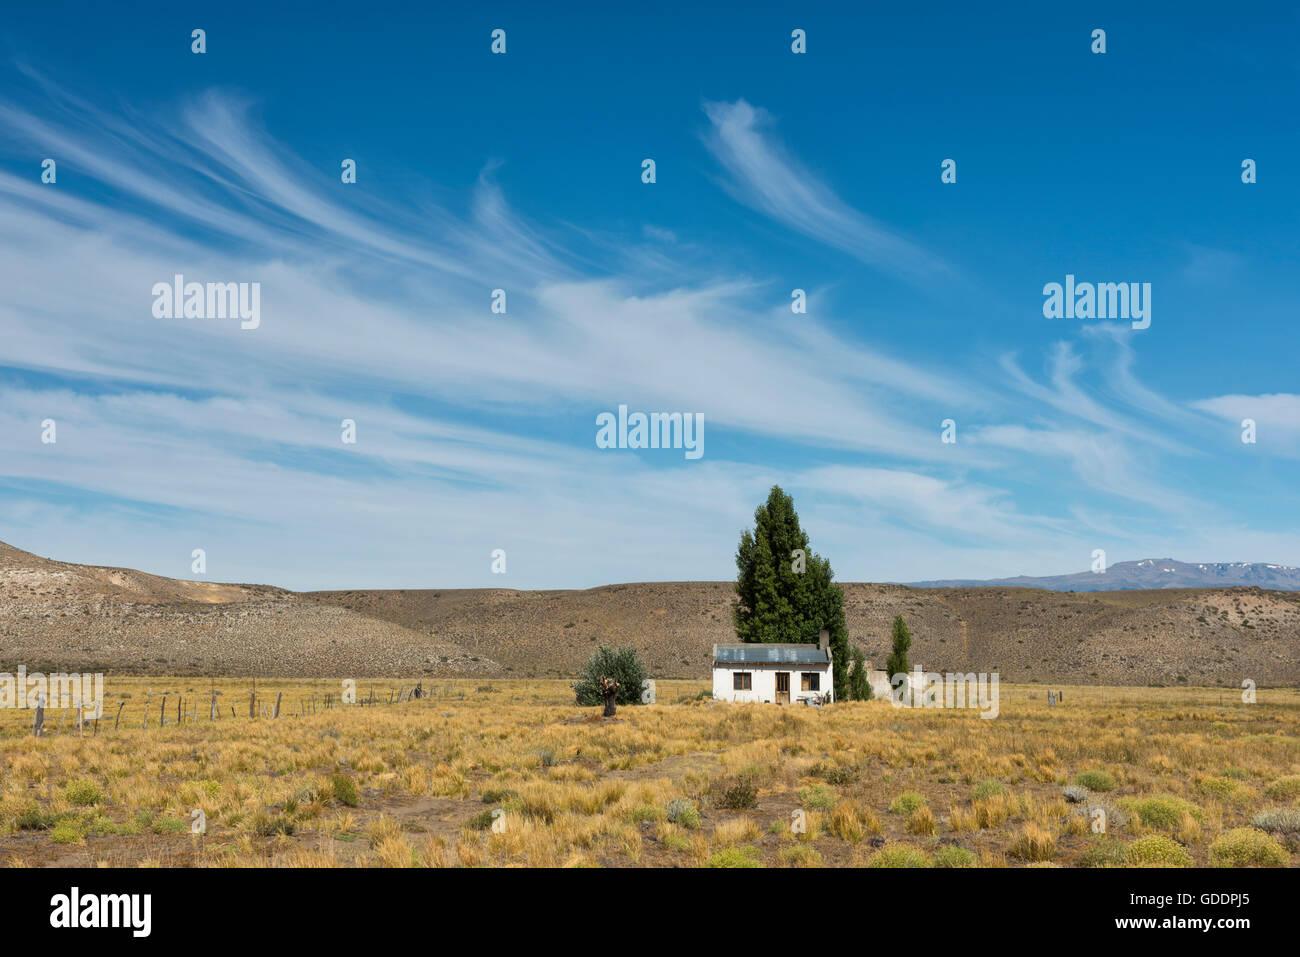 Sud America,l'Argentina,Chubut,Patagonia,casa nella Pampa Immagini Stock